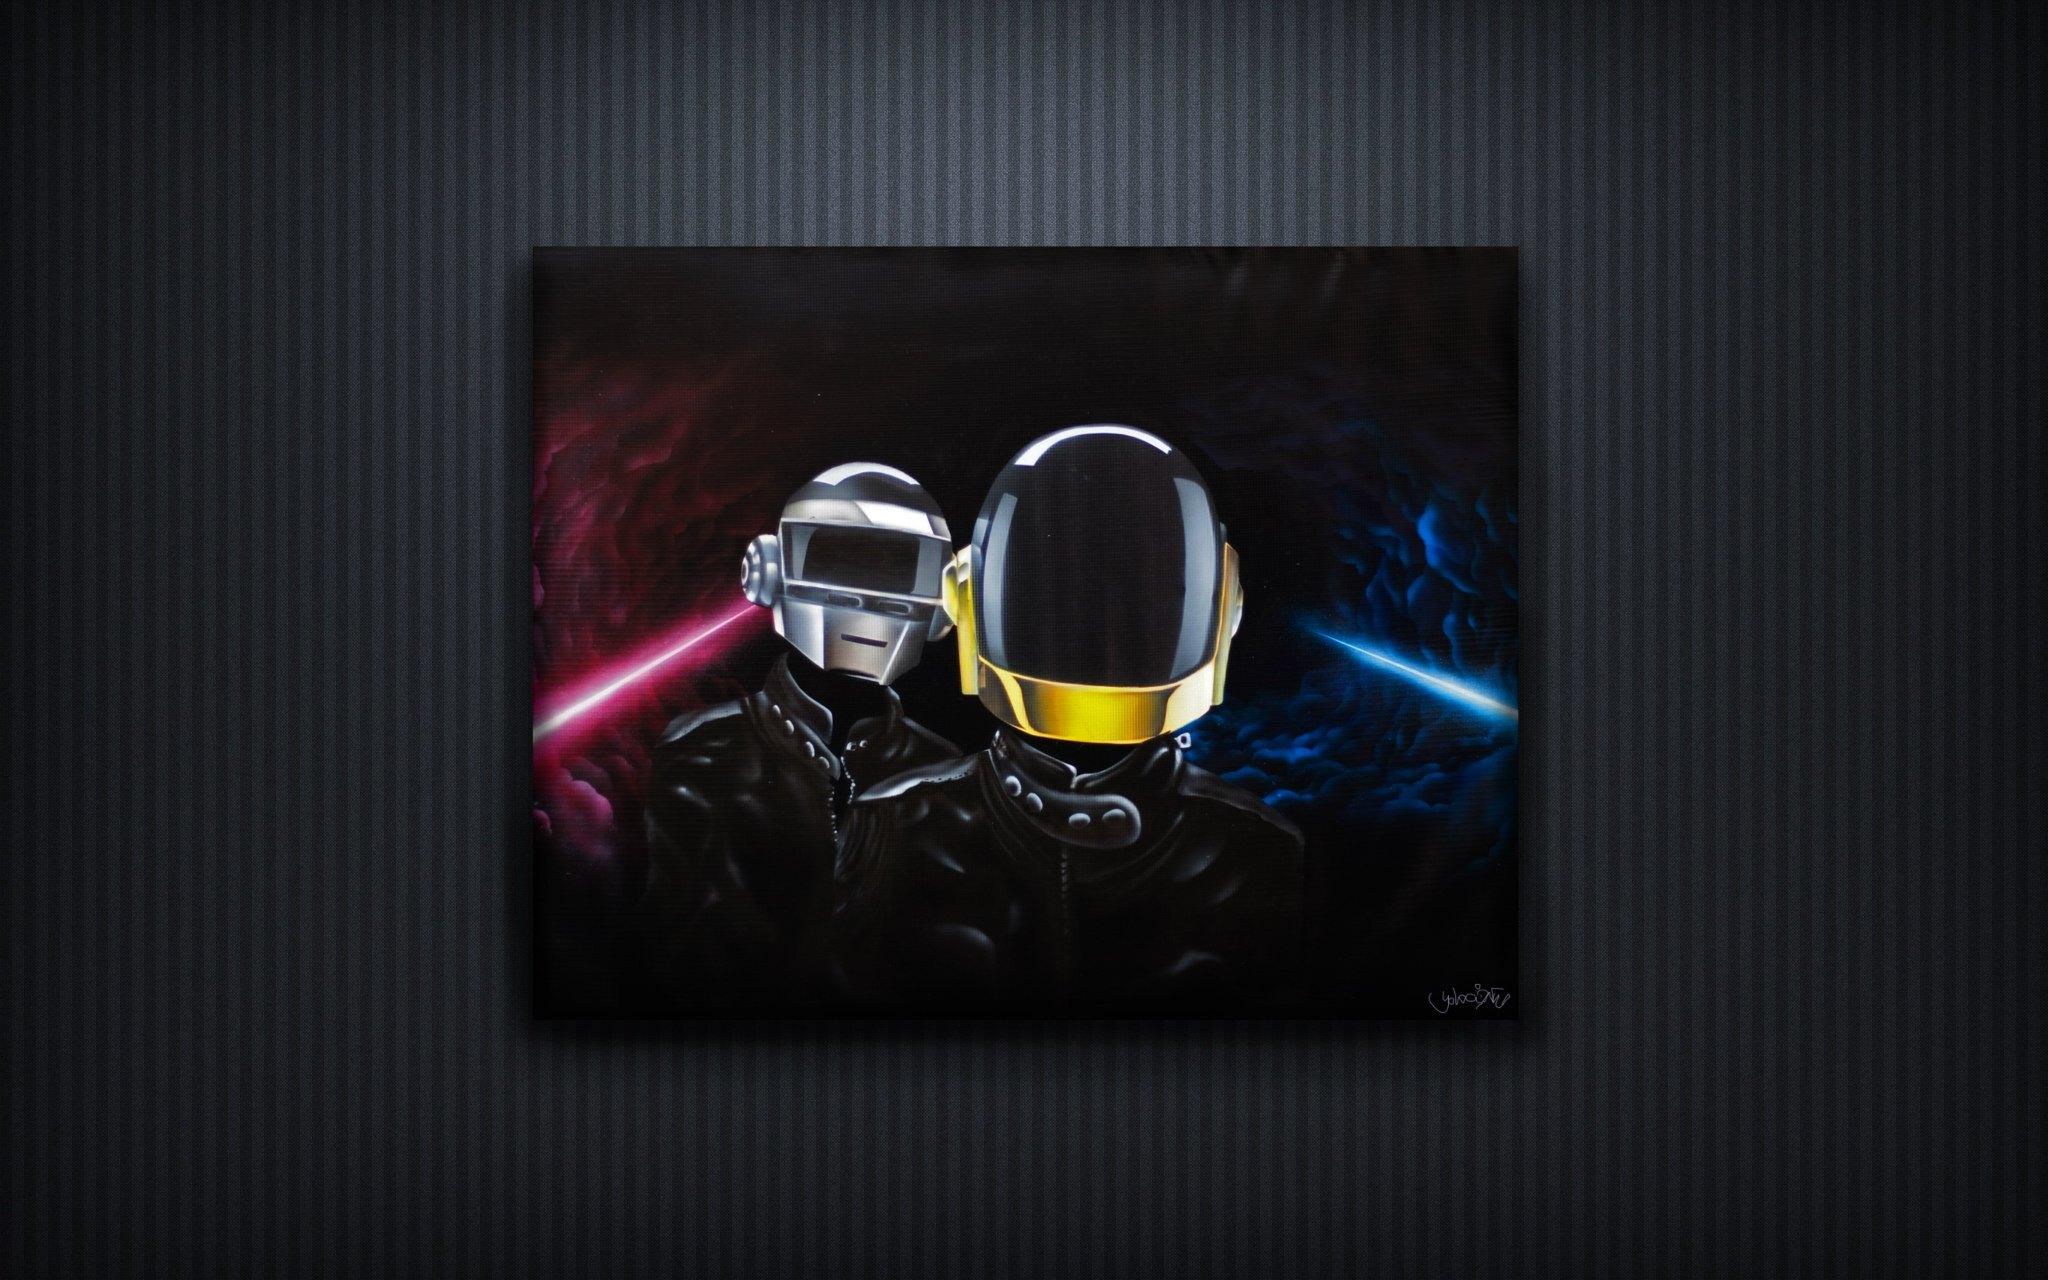 Daft Punk - Airbrush by Yolocone